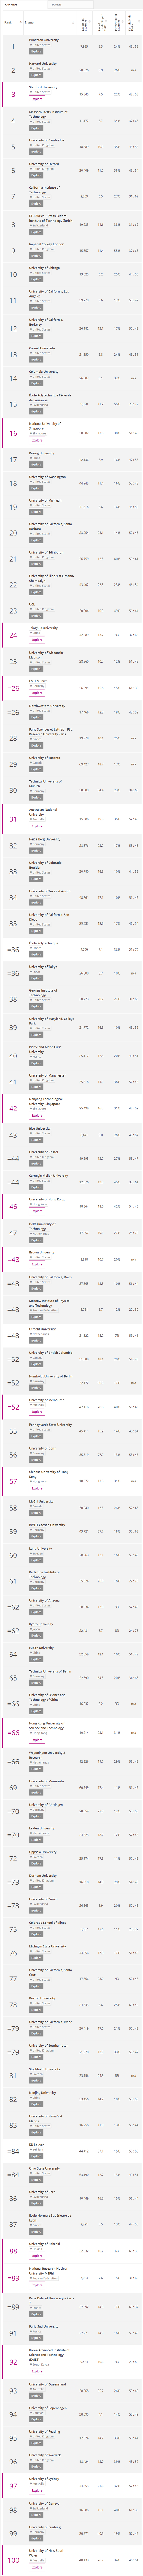 2018THE世界大学物理学科排行榜 哈佛大学居然不是第一